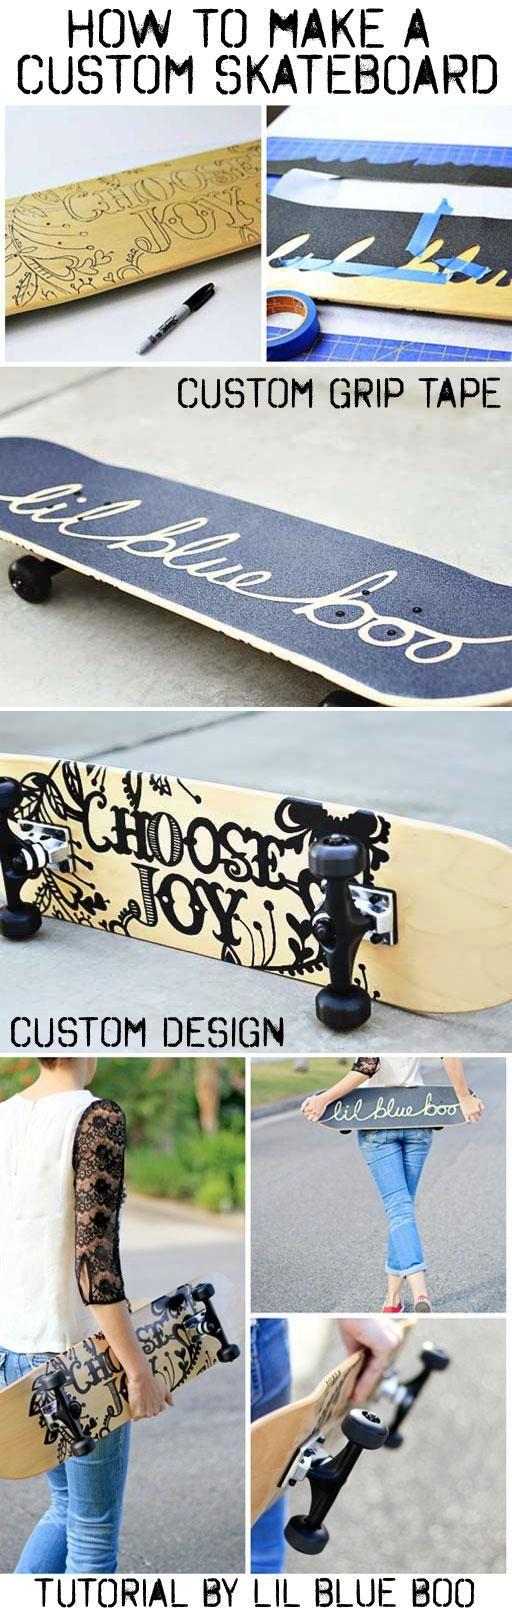 How To Make A Custom Skateboard Custom Skateboards Grip Tape Designs Skateboard